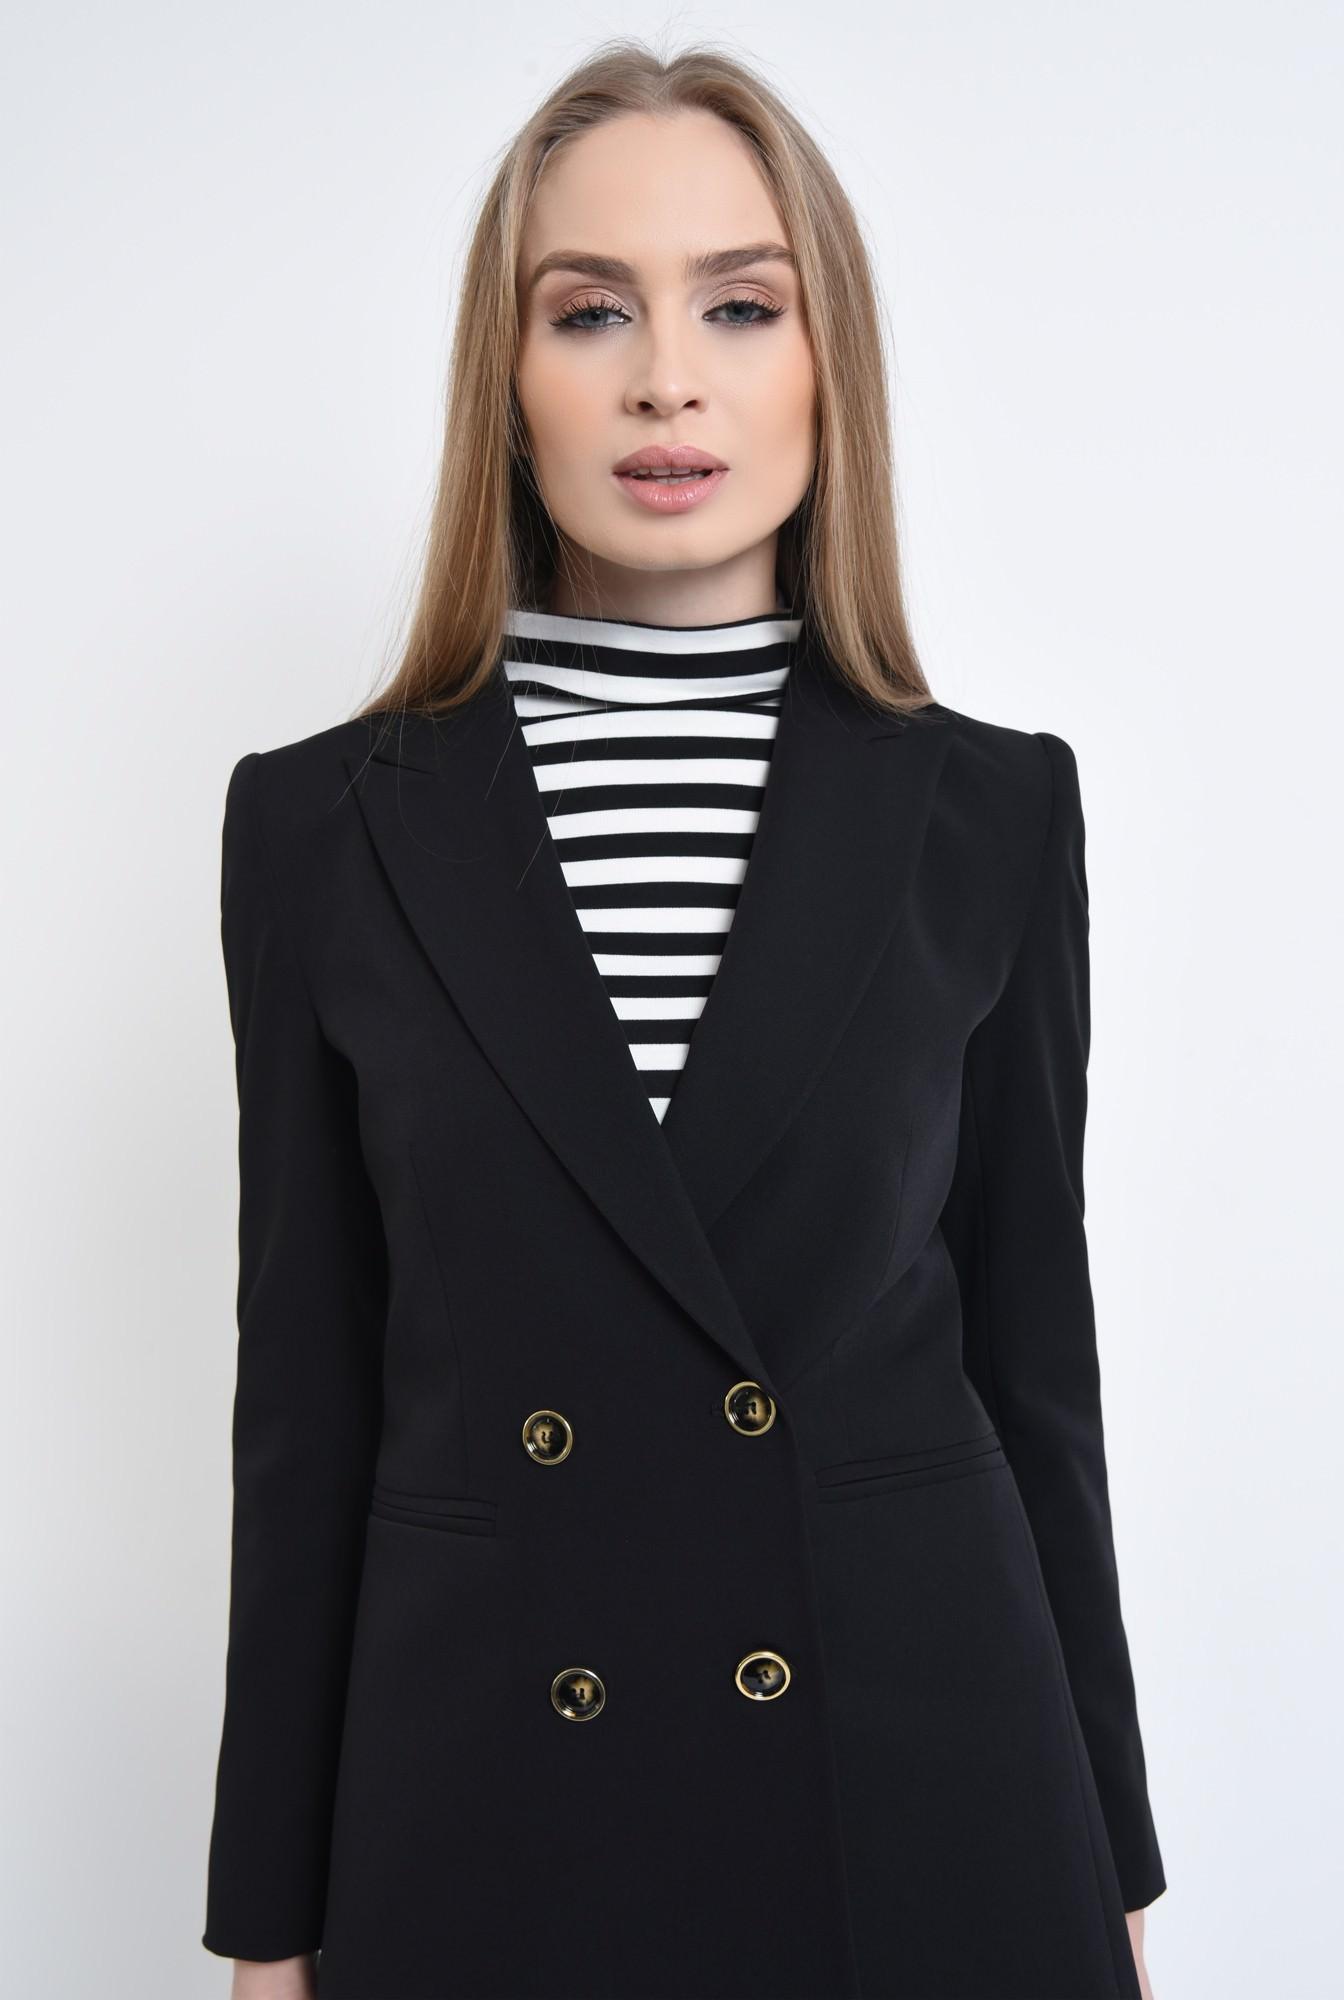 2 - Sacou casual, negru